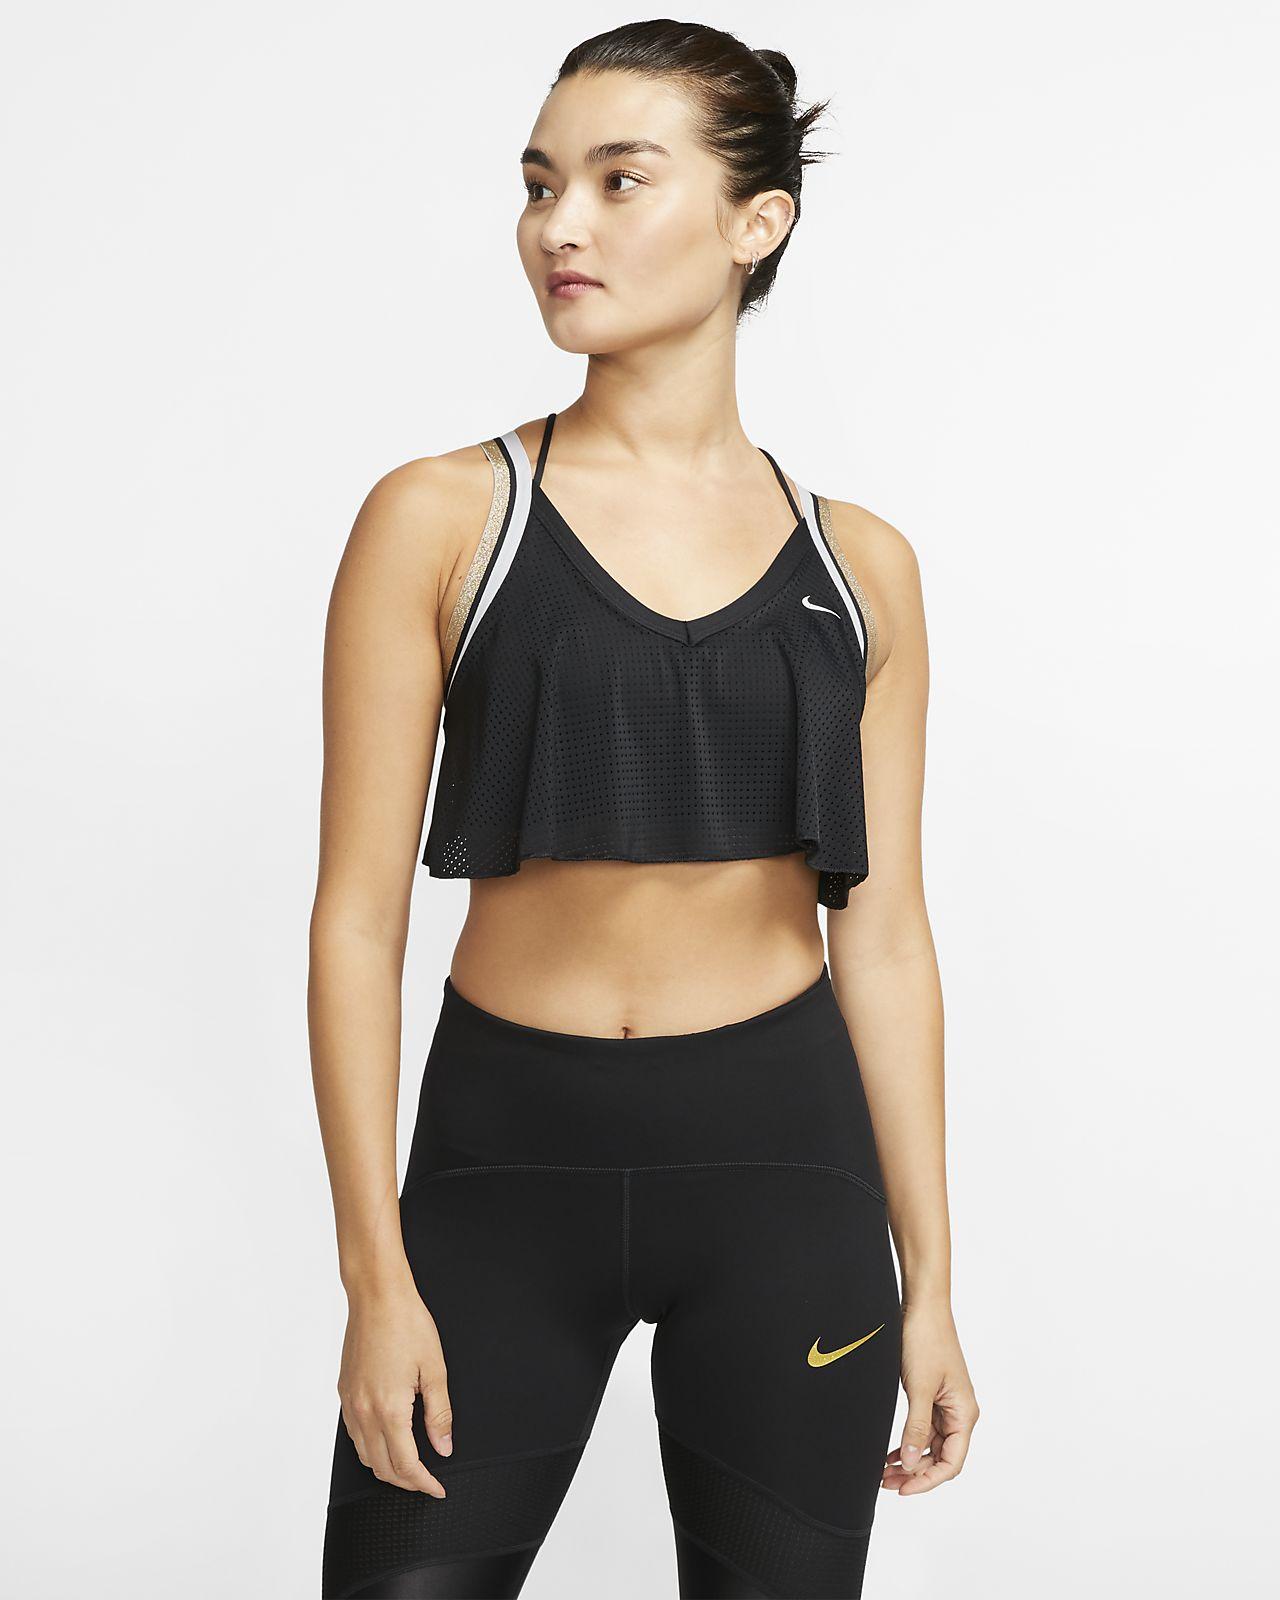 Nike 女款輕度支撐型運動內衣